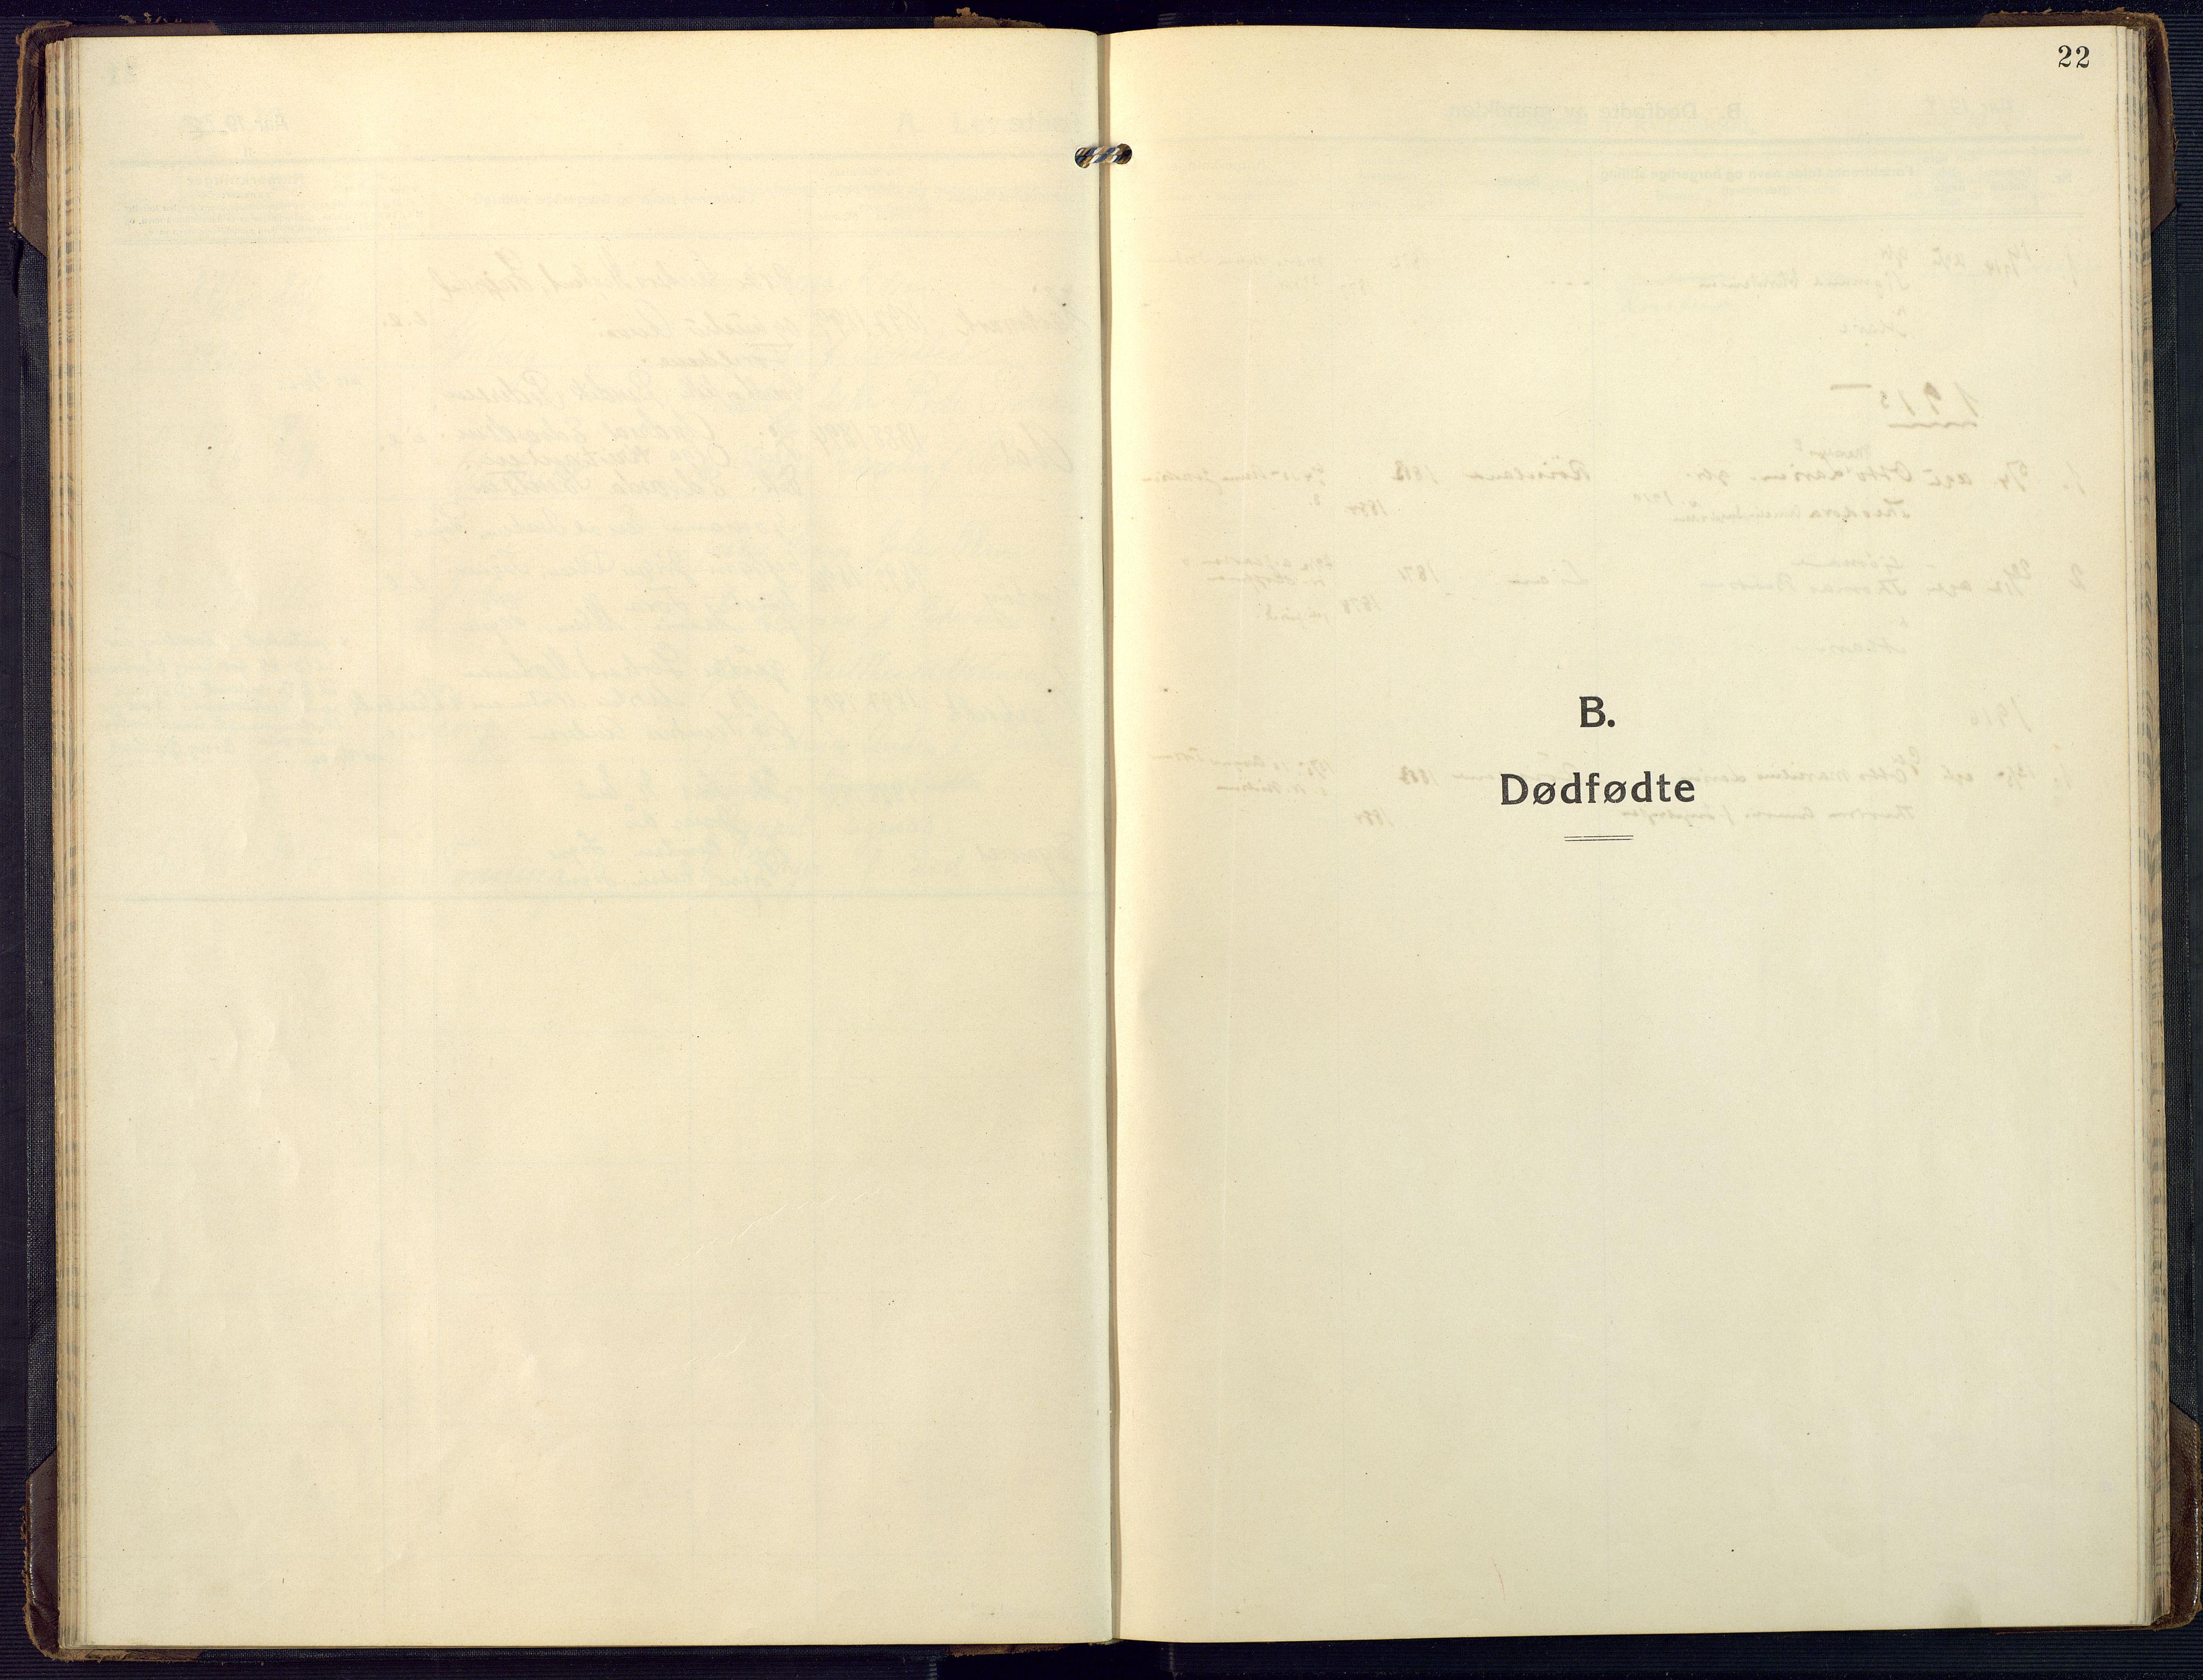 SAK, Mandal sokneprestkontor, F/Fa/Fab/L0003: Ministerialbok nr. A 3, 1913-1933, s. 22